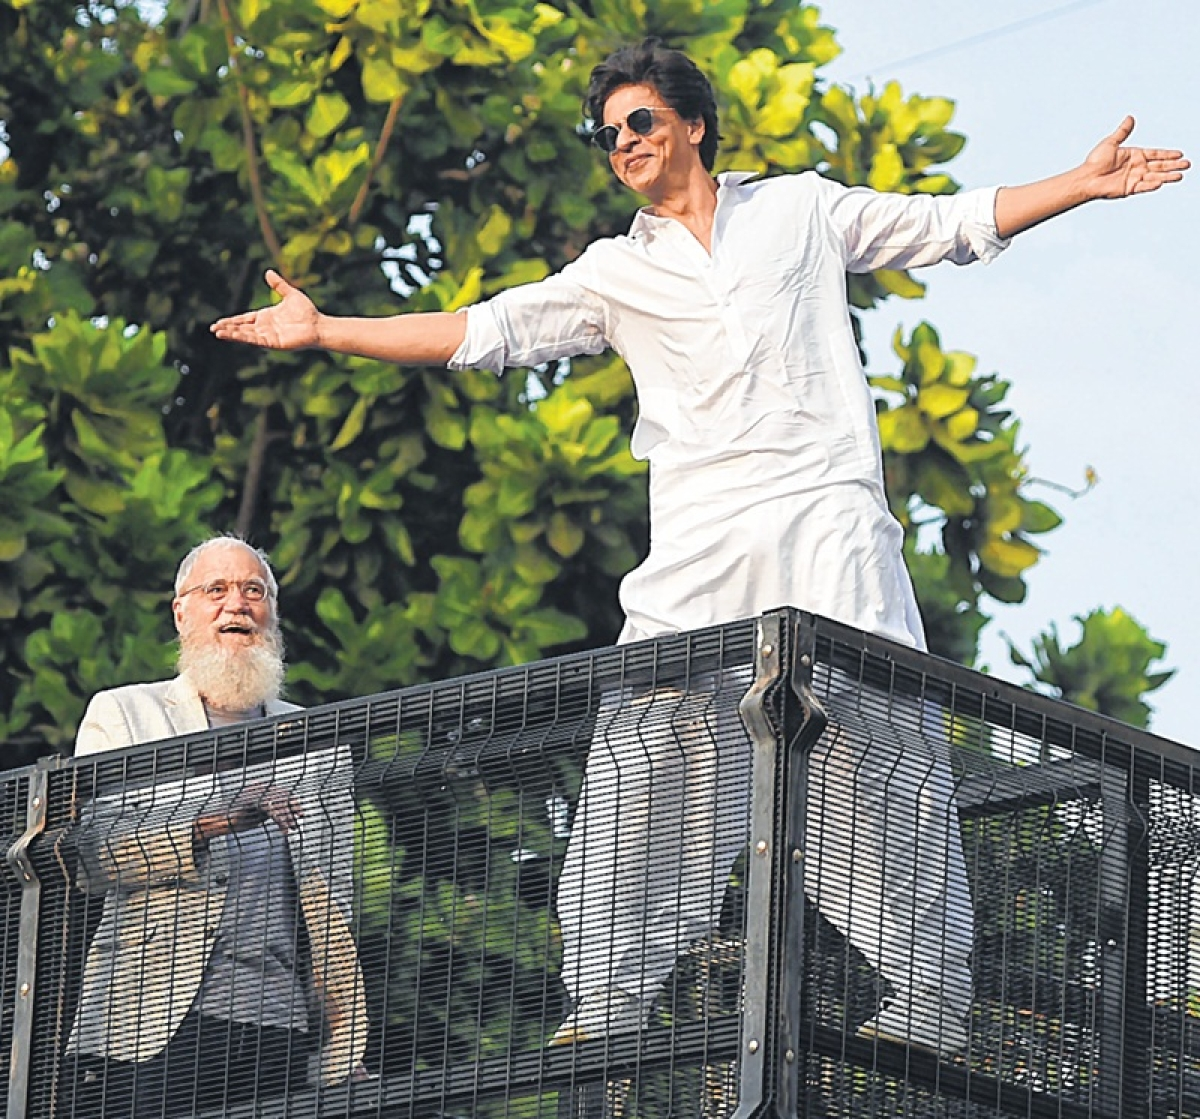 Shah Rukh Khan greets fans on Eid, David Letterman joins him to witness fan mania